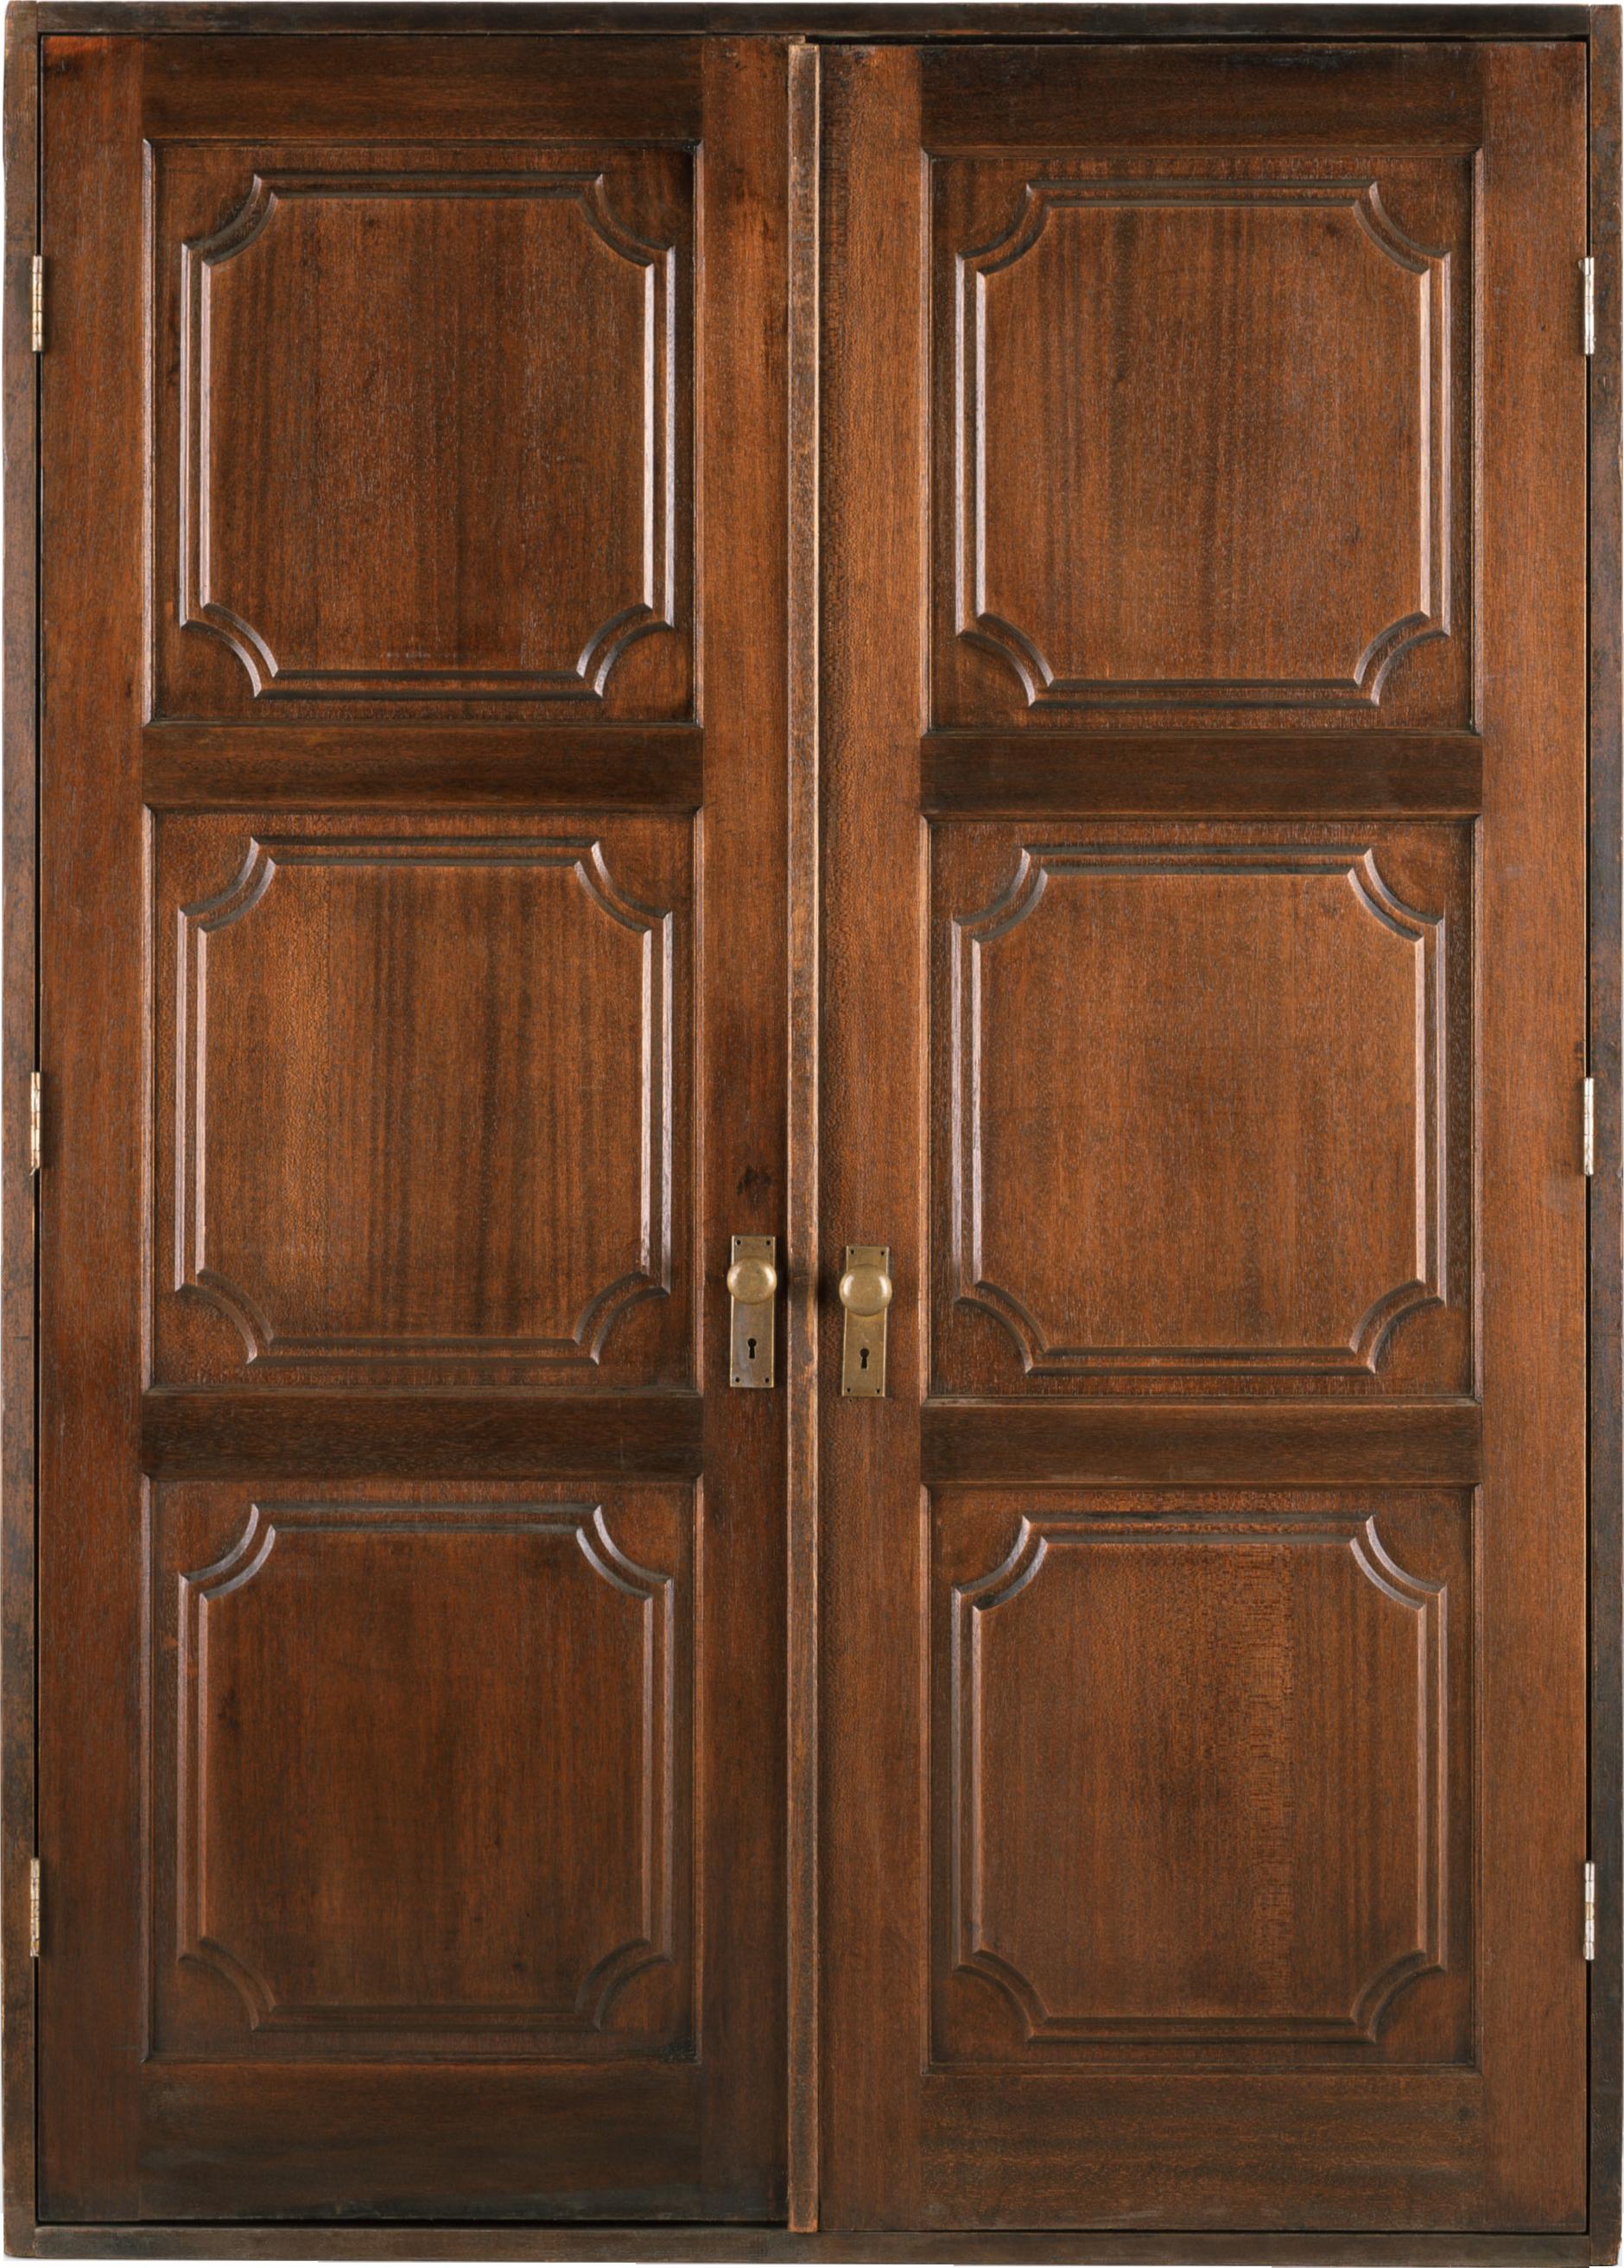 closed wooden door PNG Image - PurePNG | Free transparent CC0 PNG ...